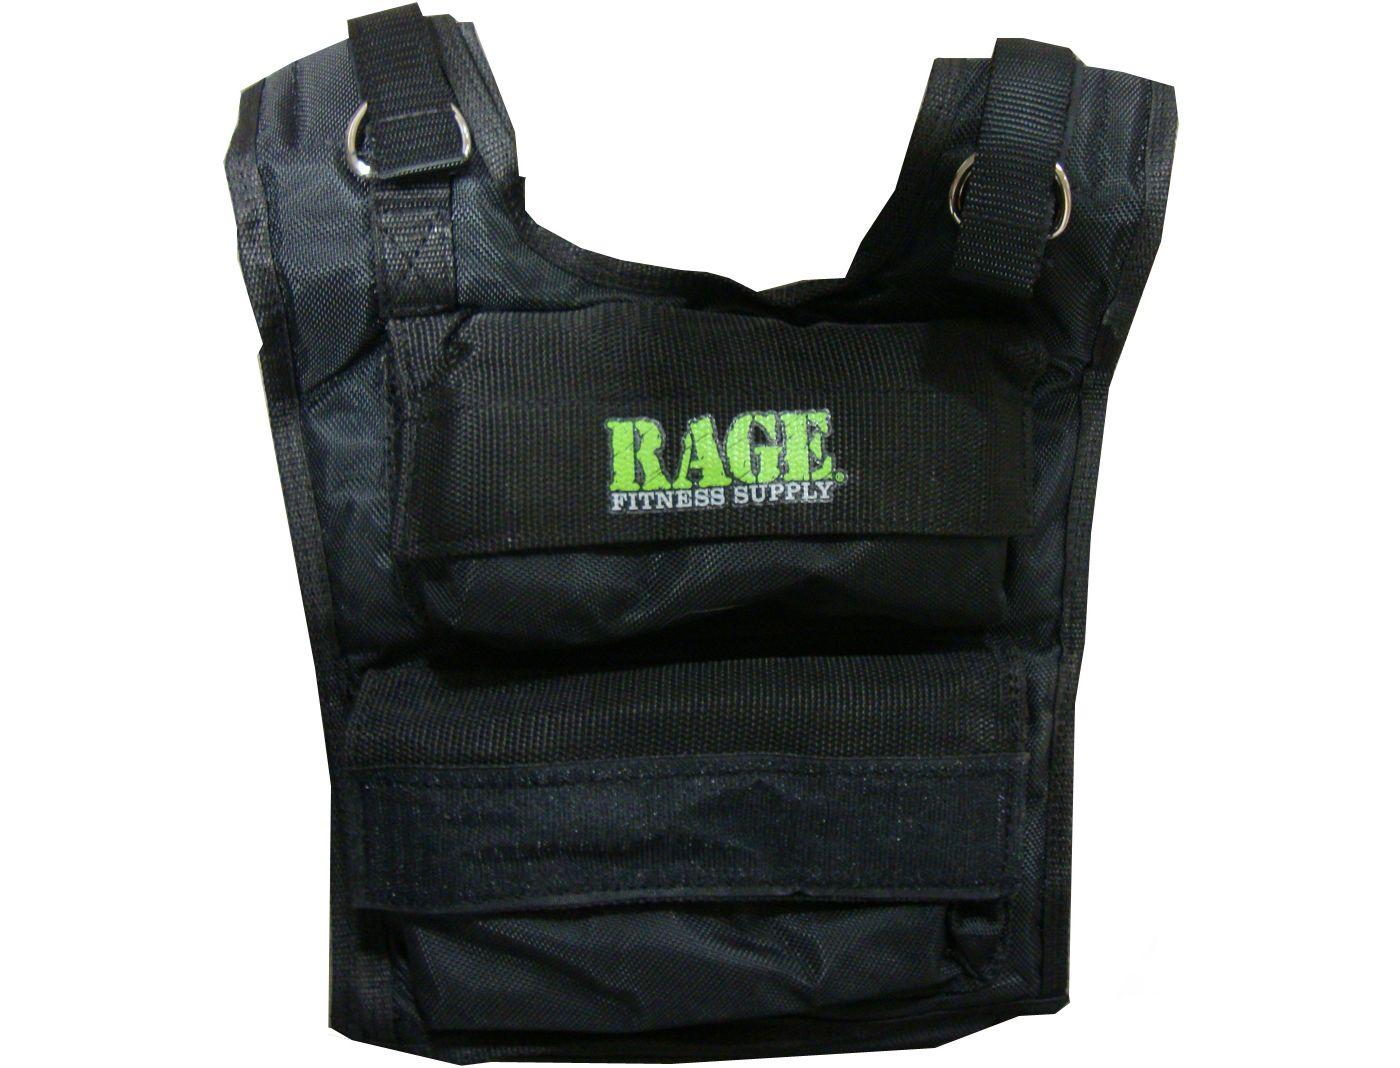 RAGE 3 - 36 lb Adjustable Weighted Vest